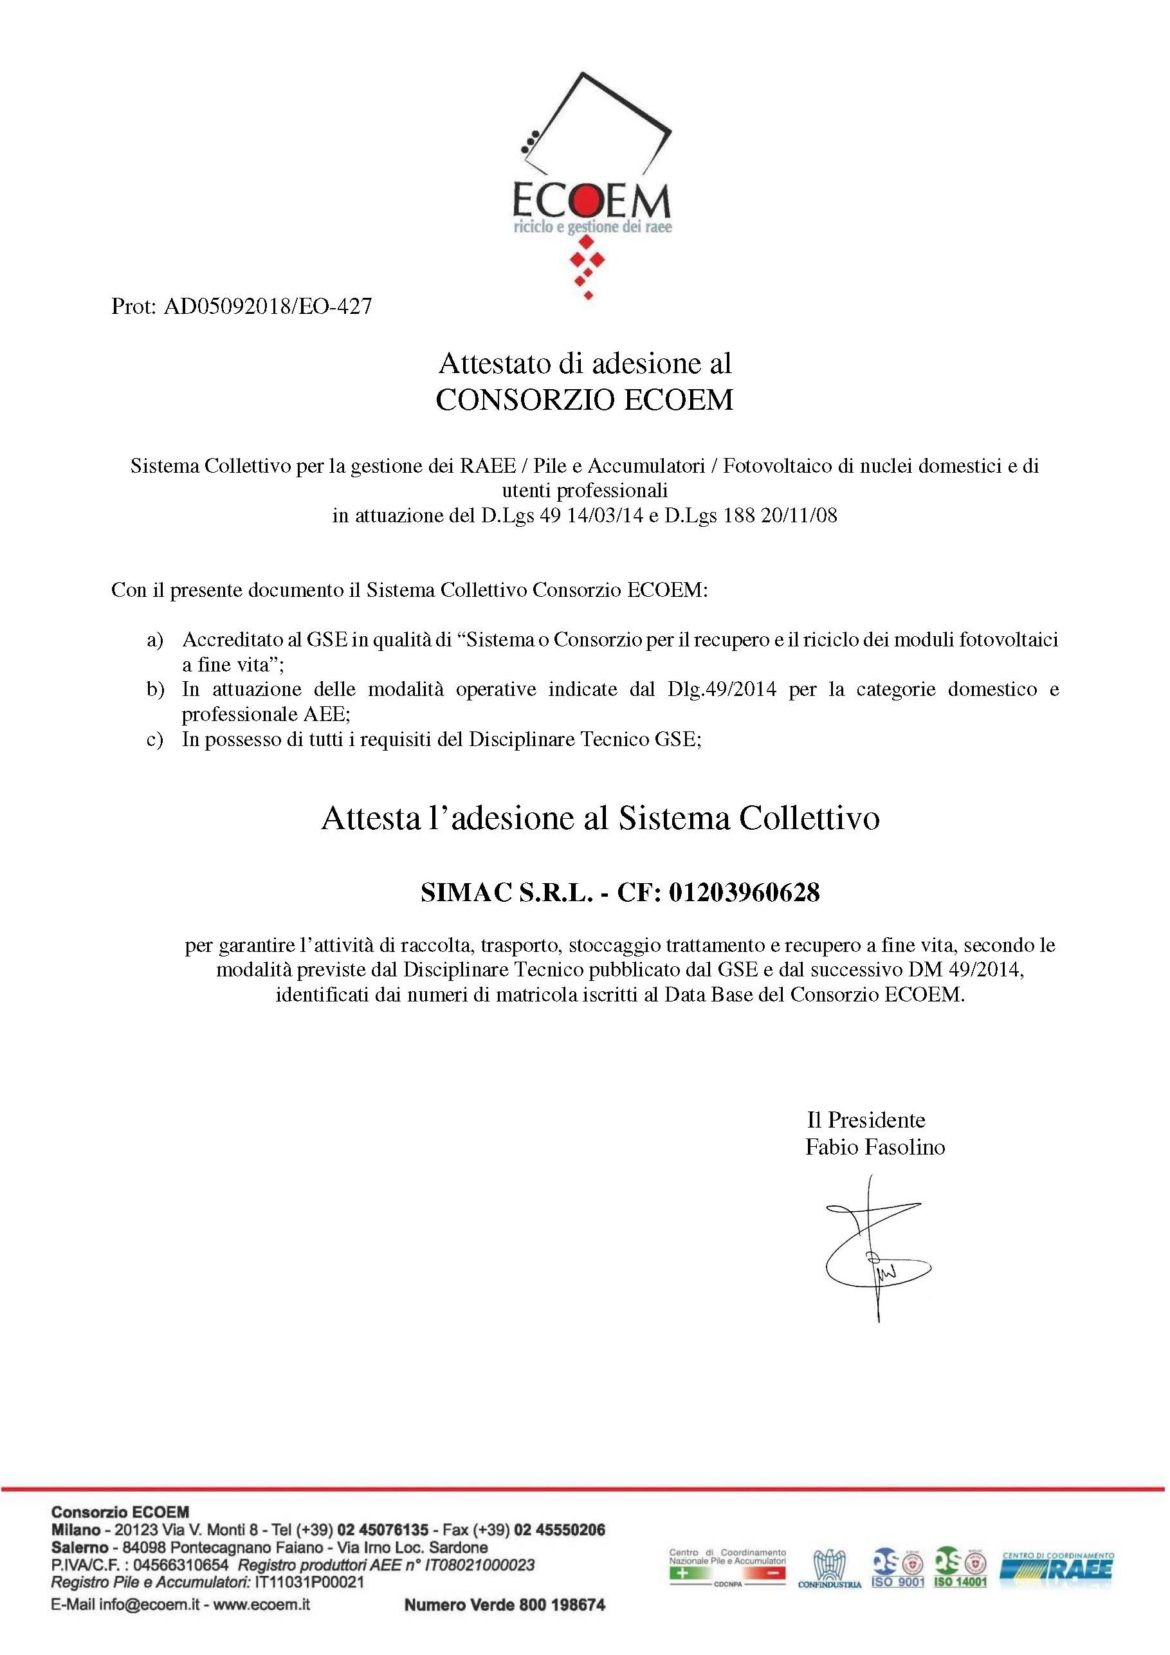 ECOEM-Certificato.jpg